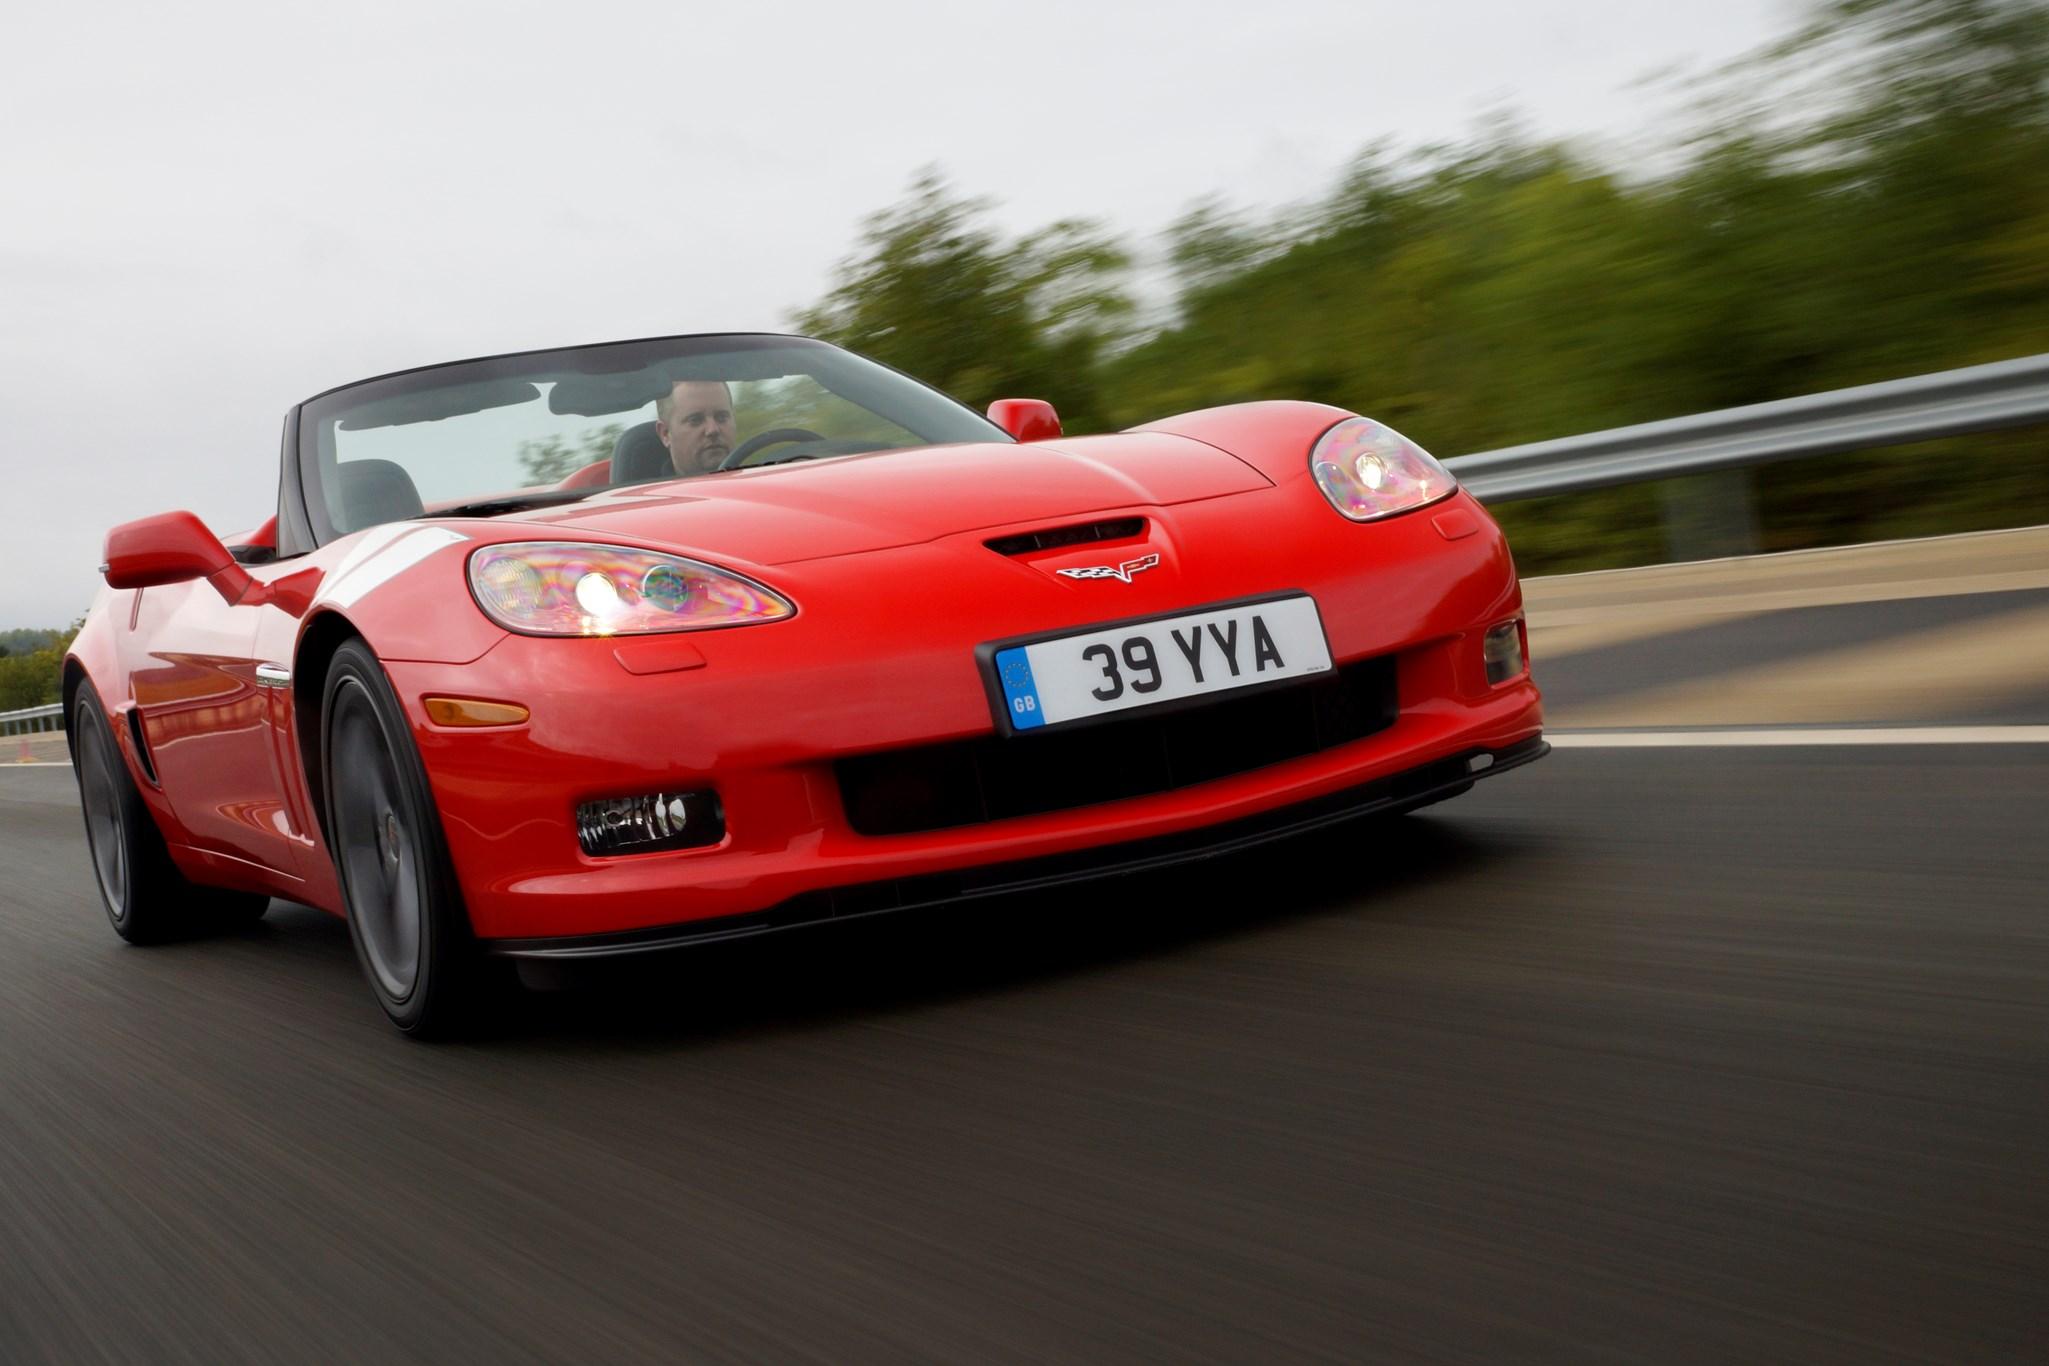 Corvette C6 by CAR Magazine